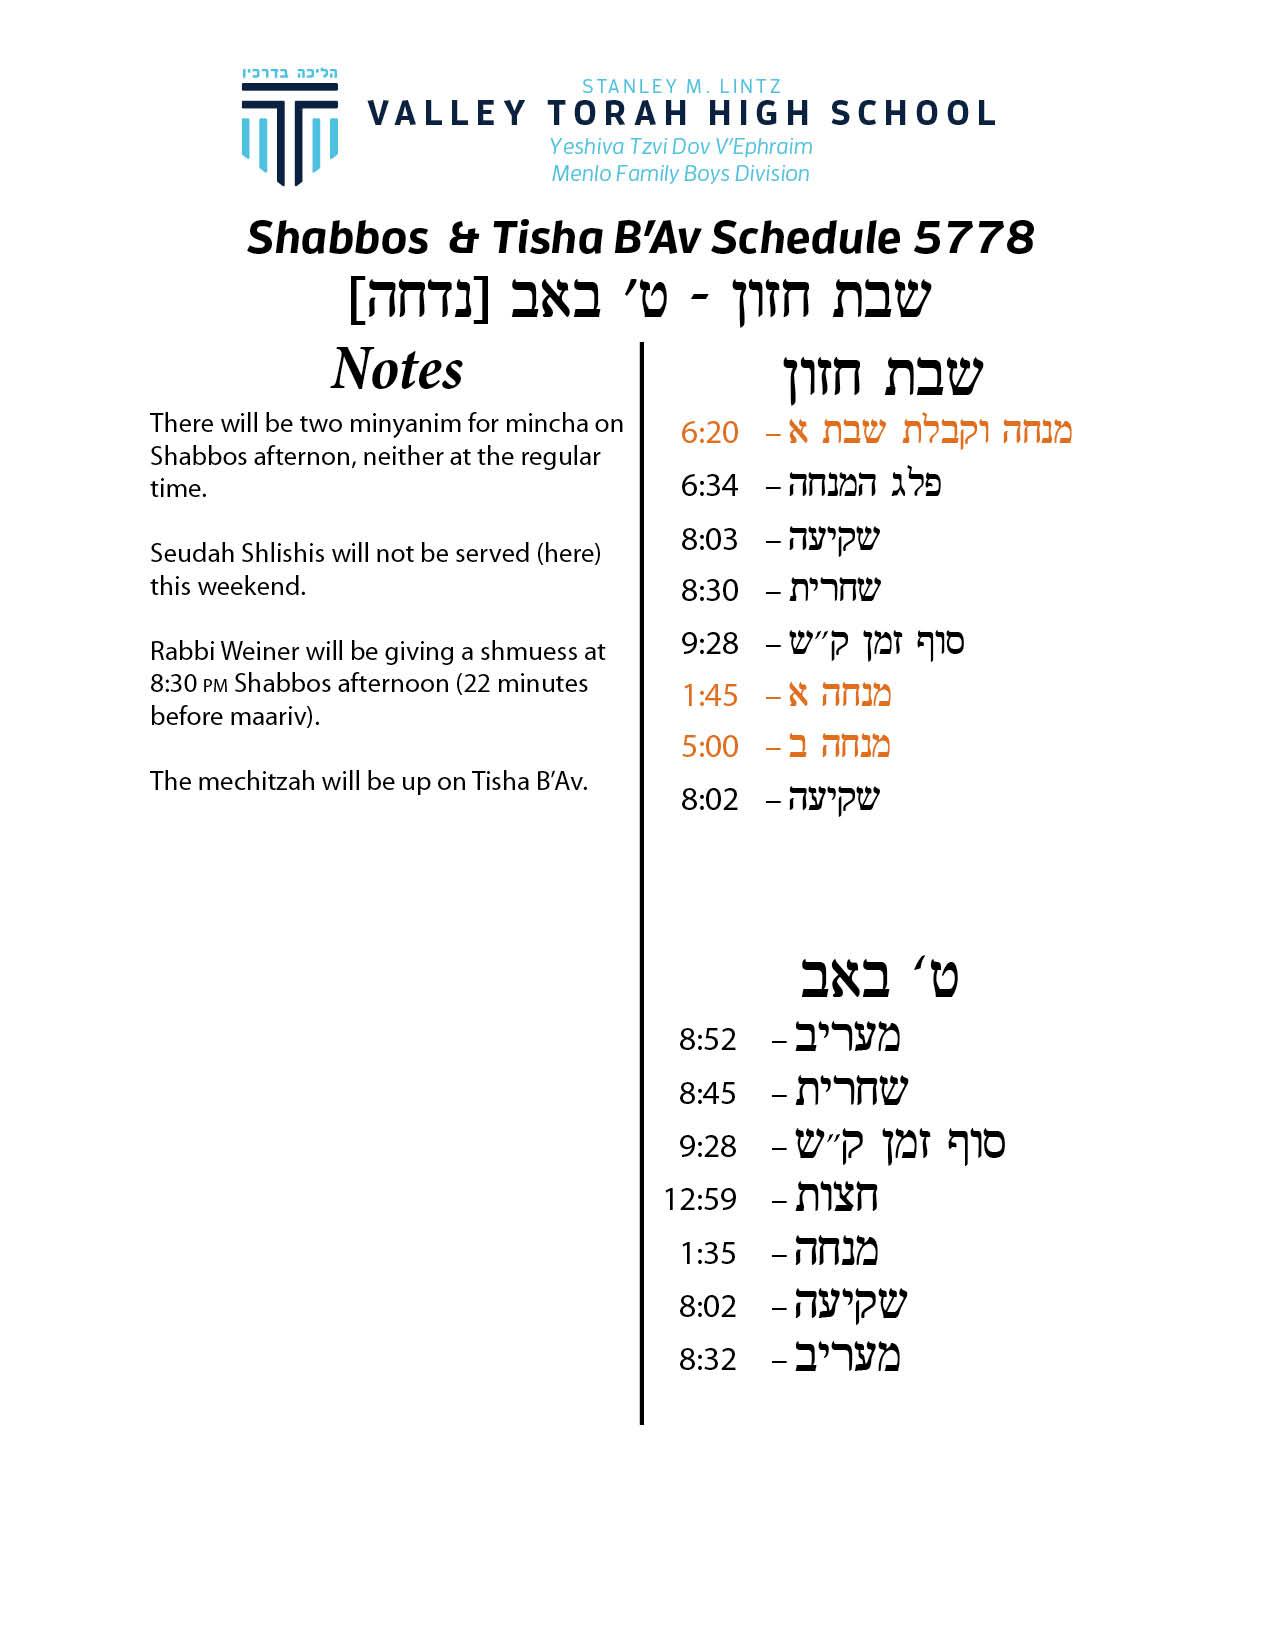 Tisha b'av Schedule 5778.jpg